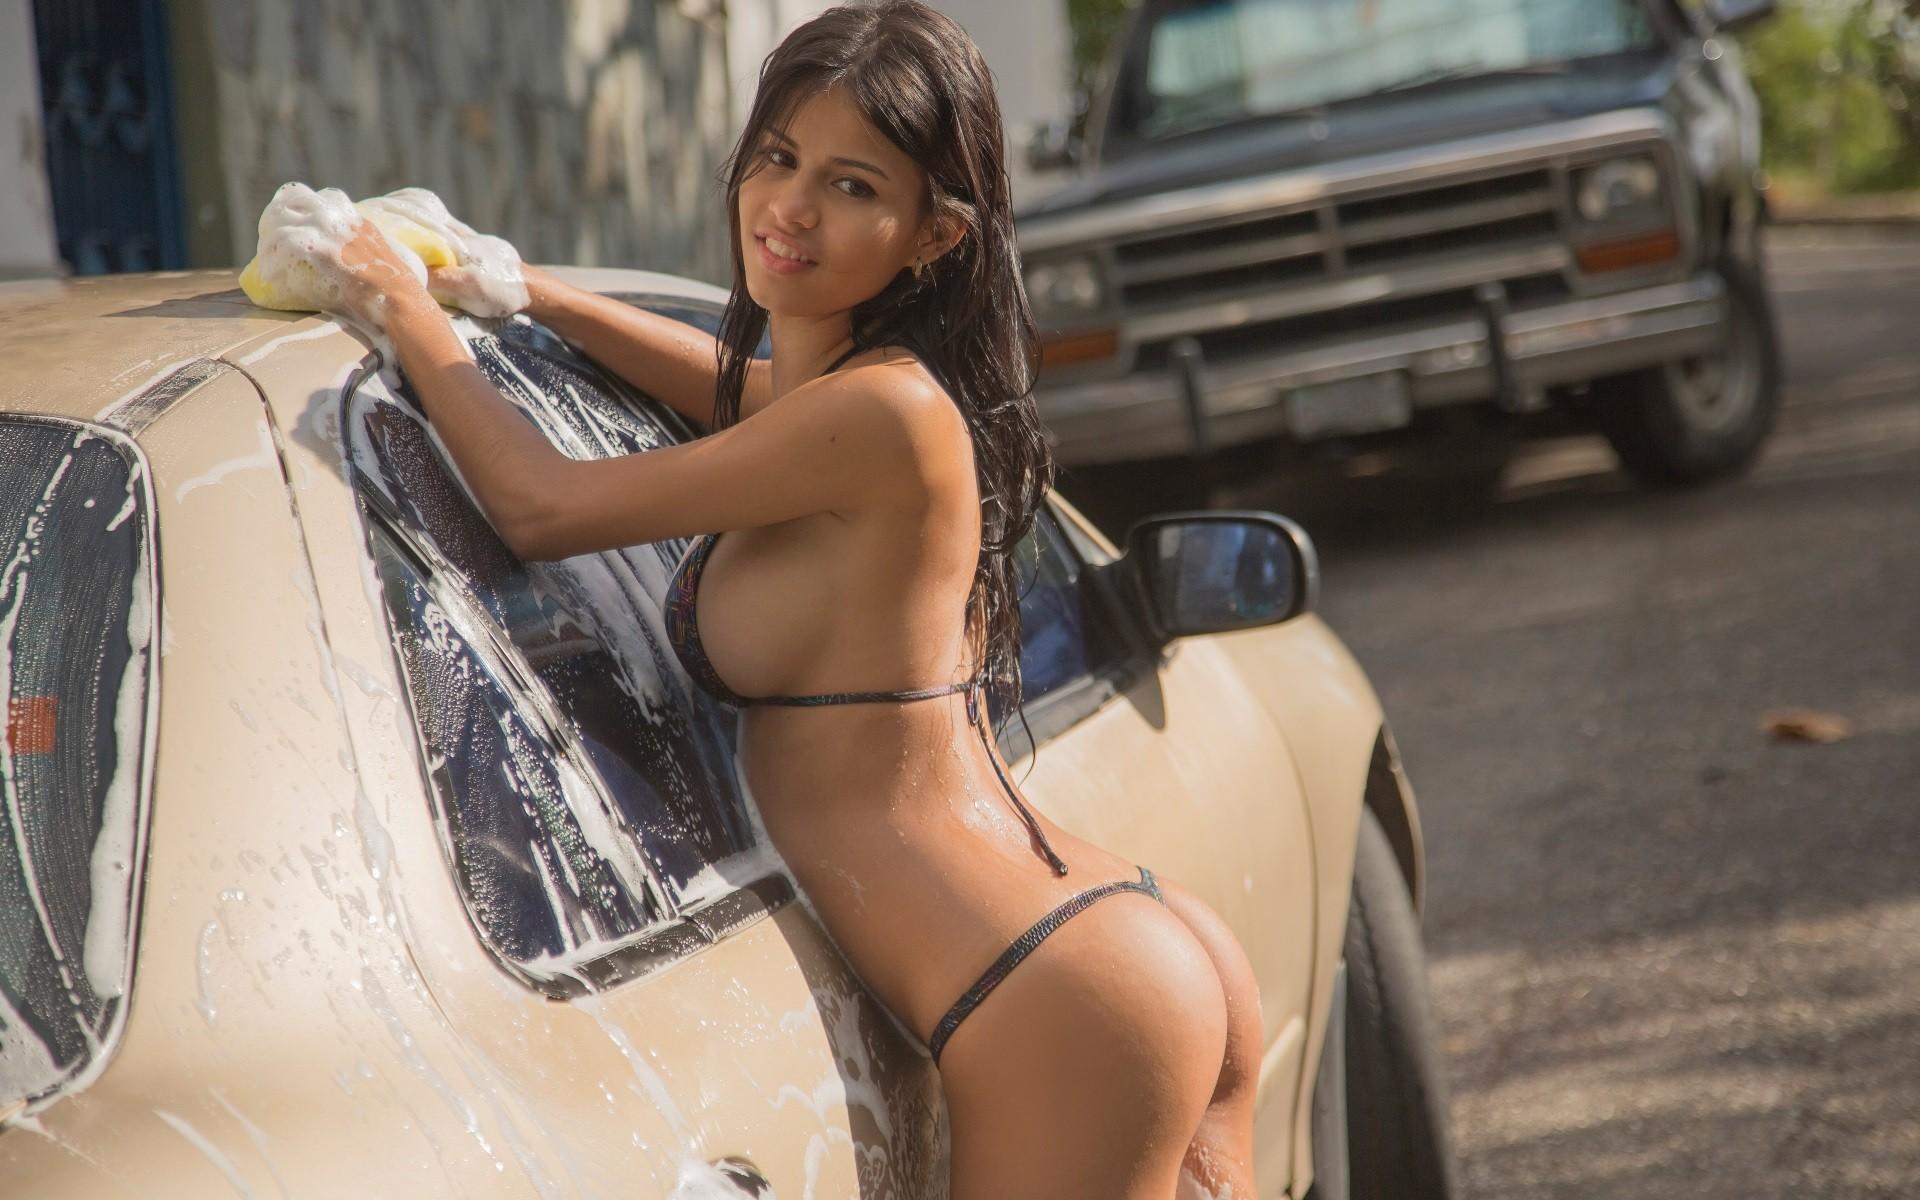 fucked-sexy-naked-wash-rose